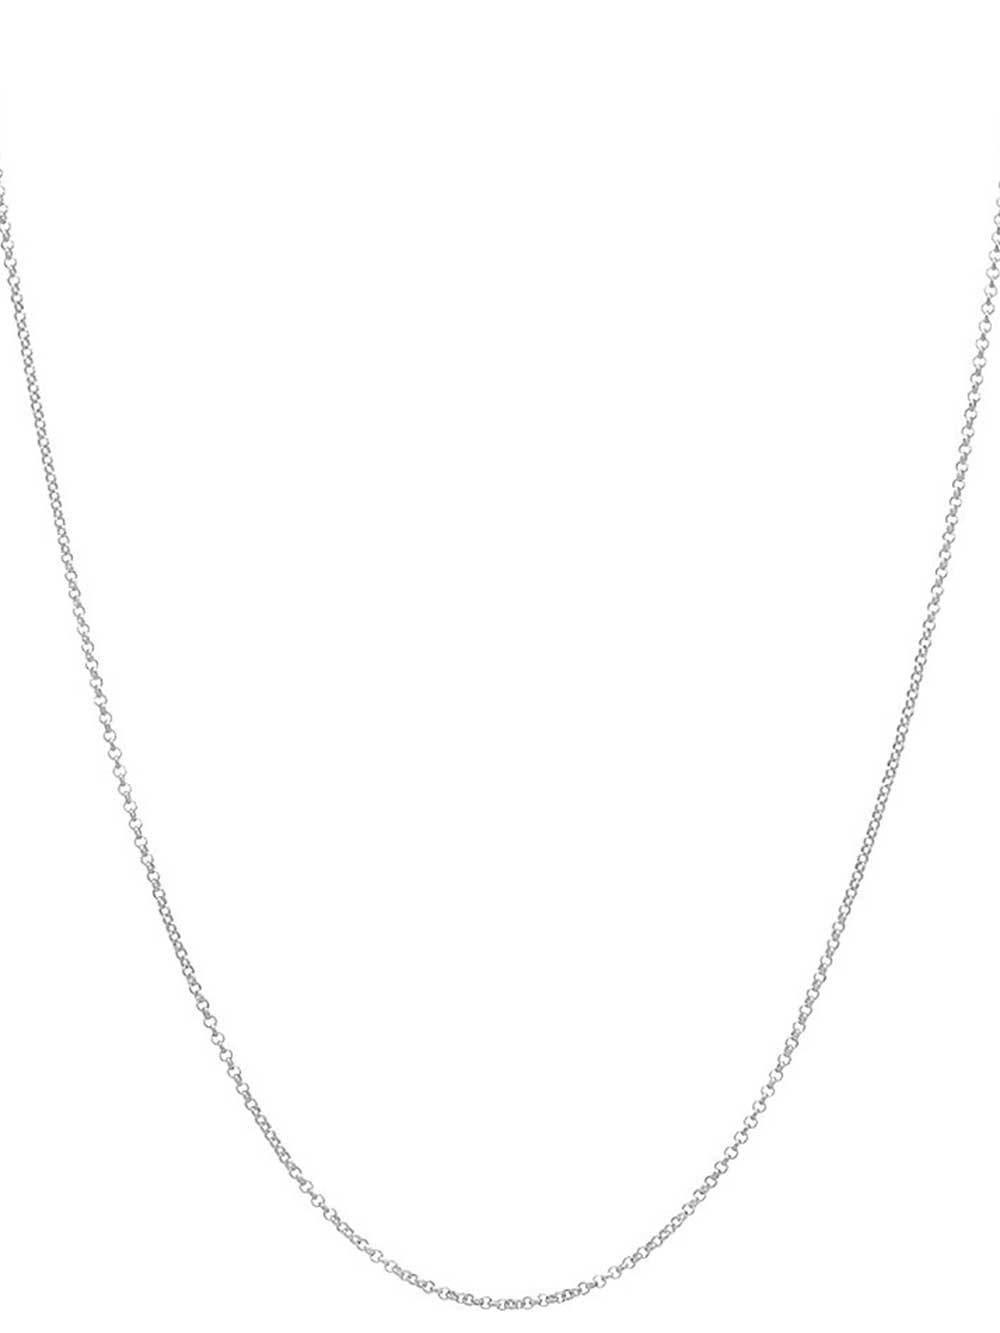 Thomas Sabo Halskette X0001-001-12-S 925er 45cm